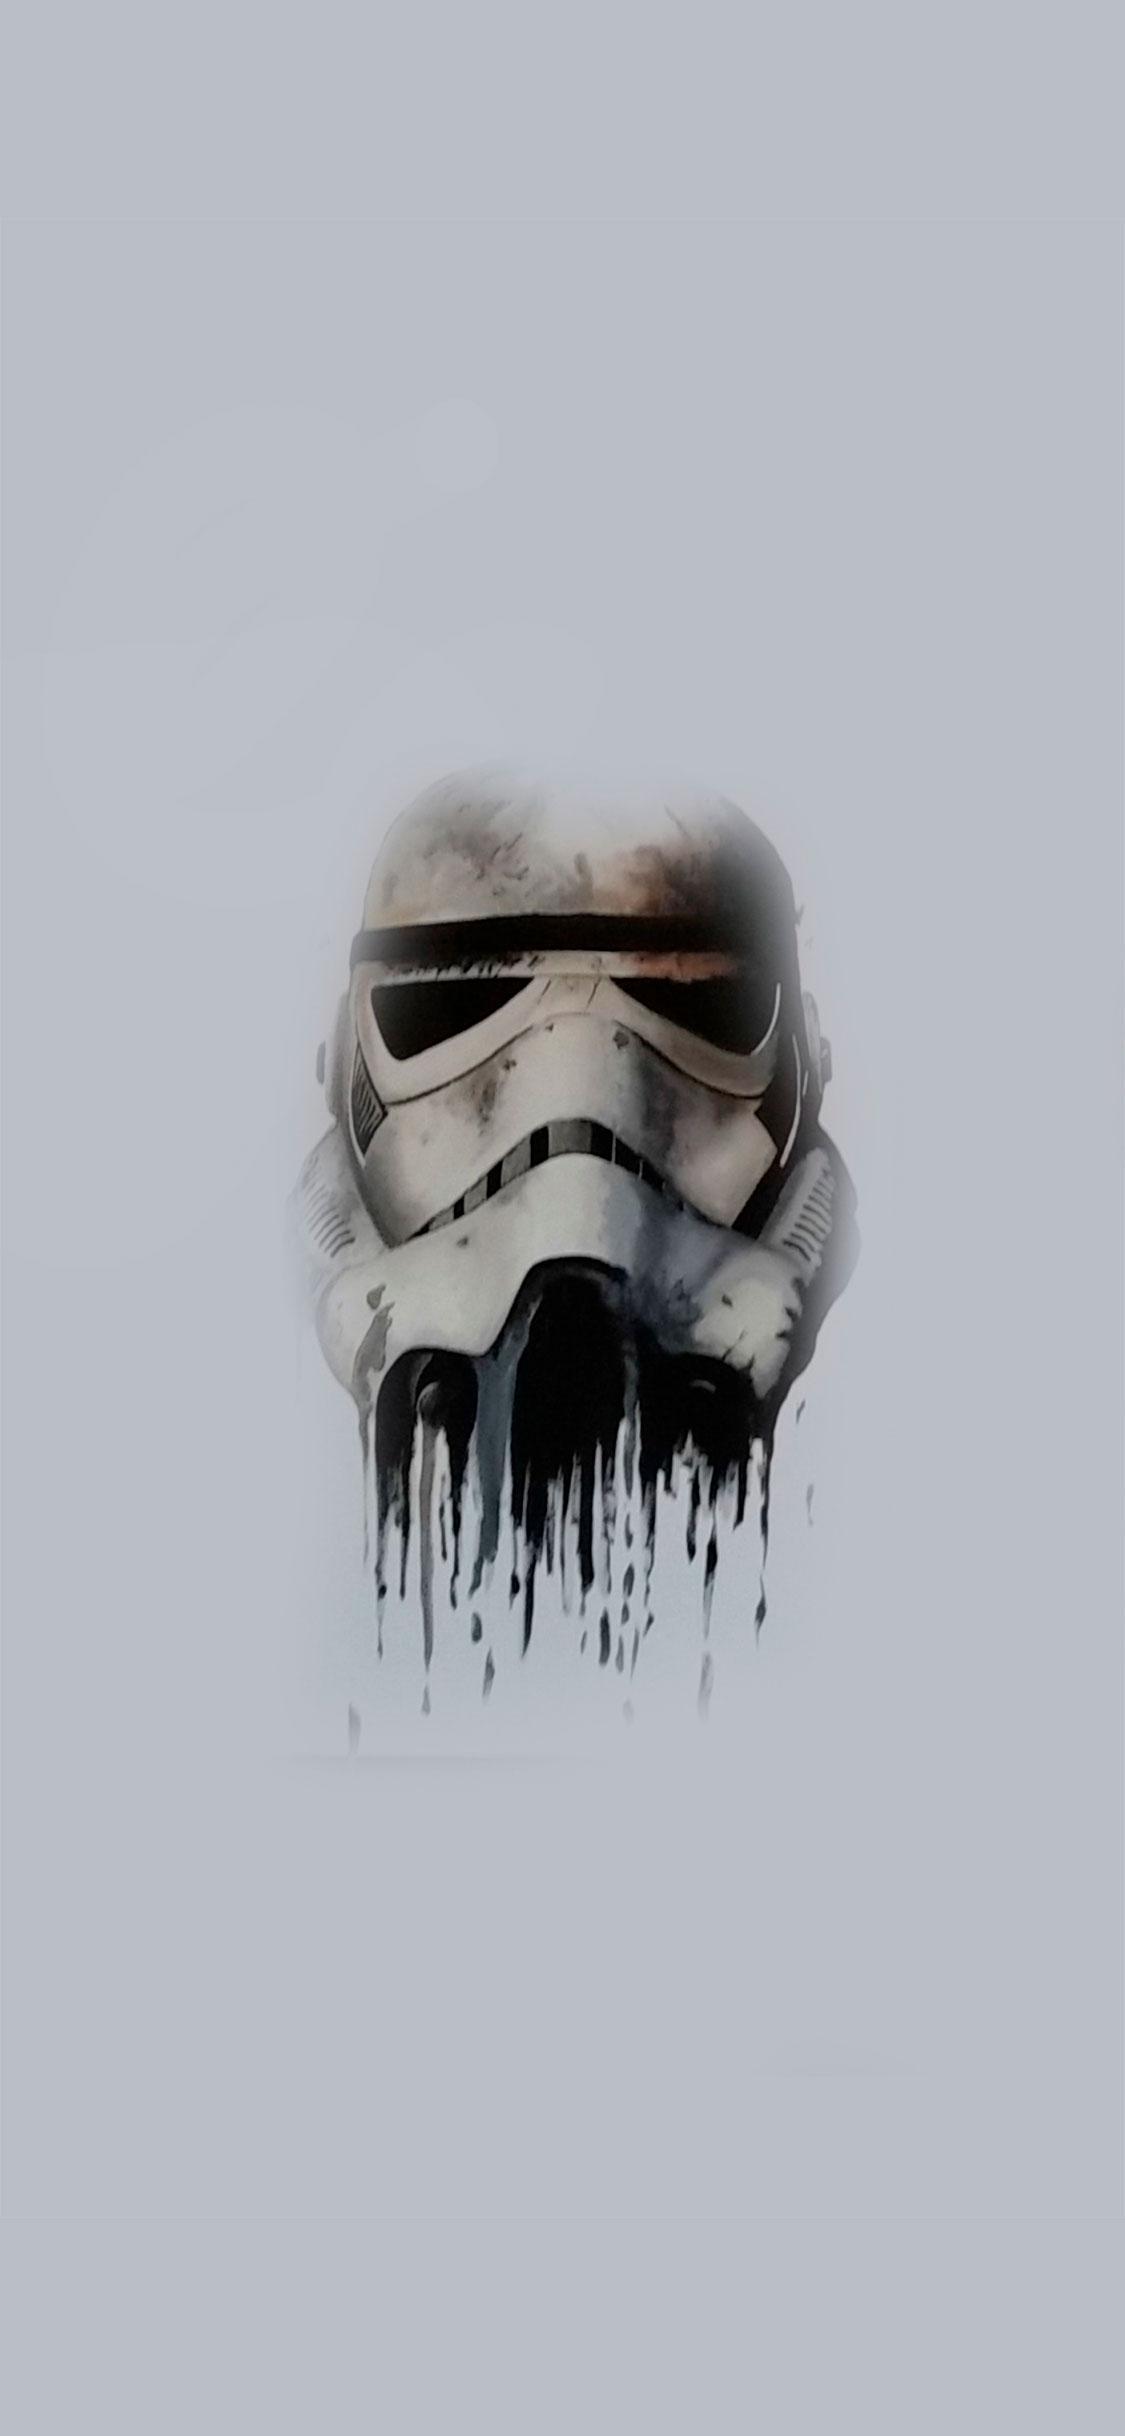 iPhone wallpaper star wars1 Star Wars